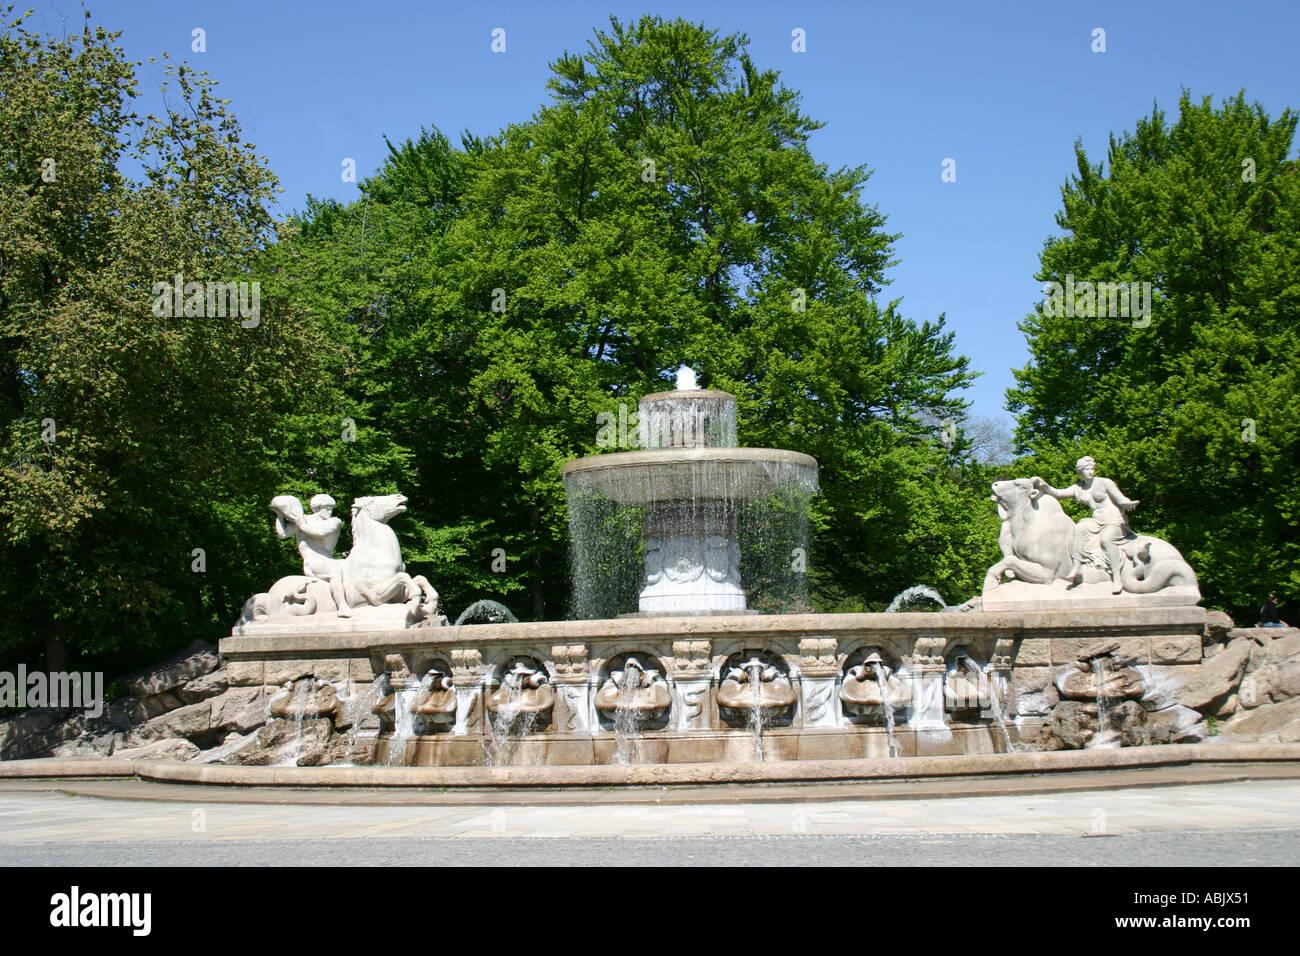 Wittelsbach fountain Lenbachplatz Munich Bavaria Germany - Stock Image